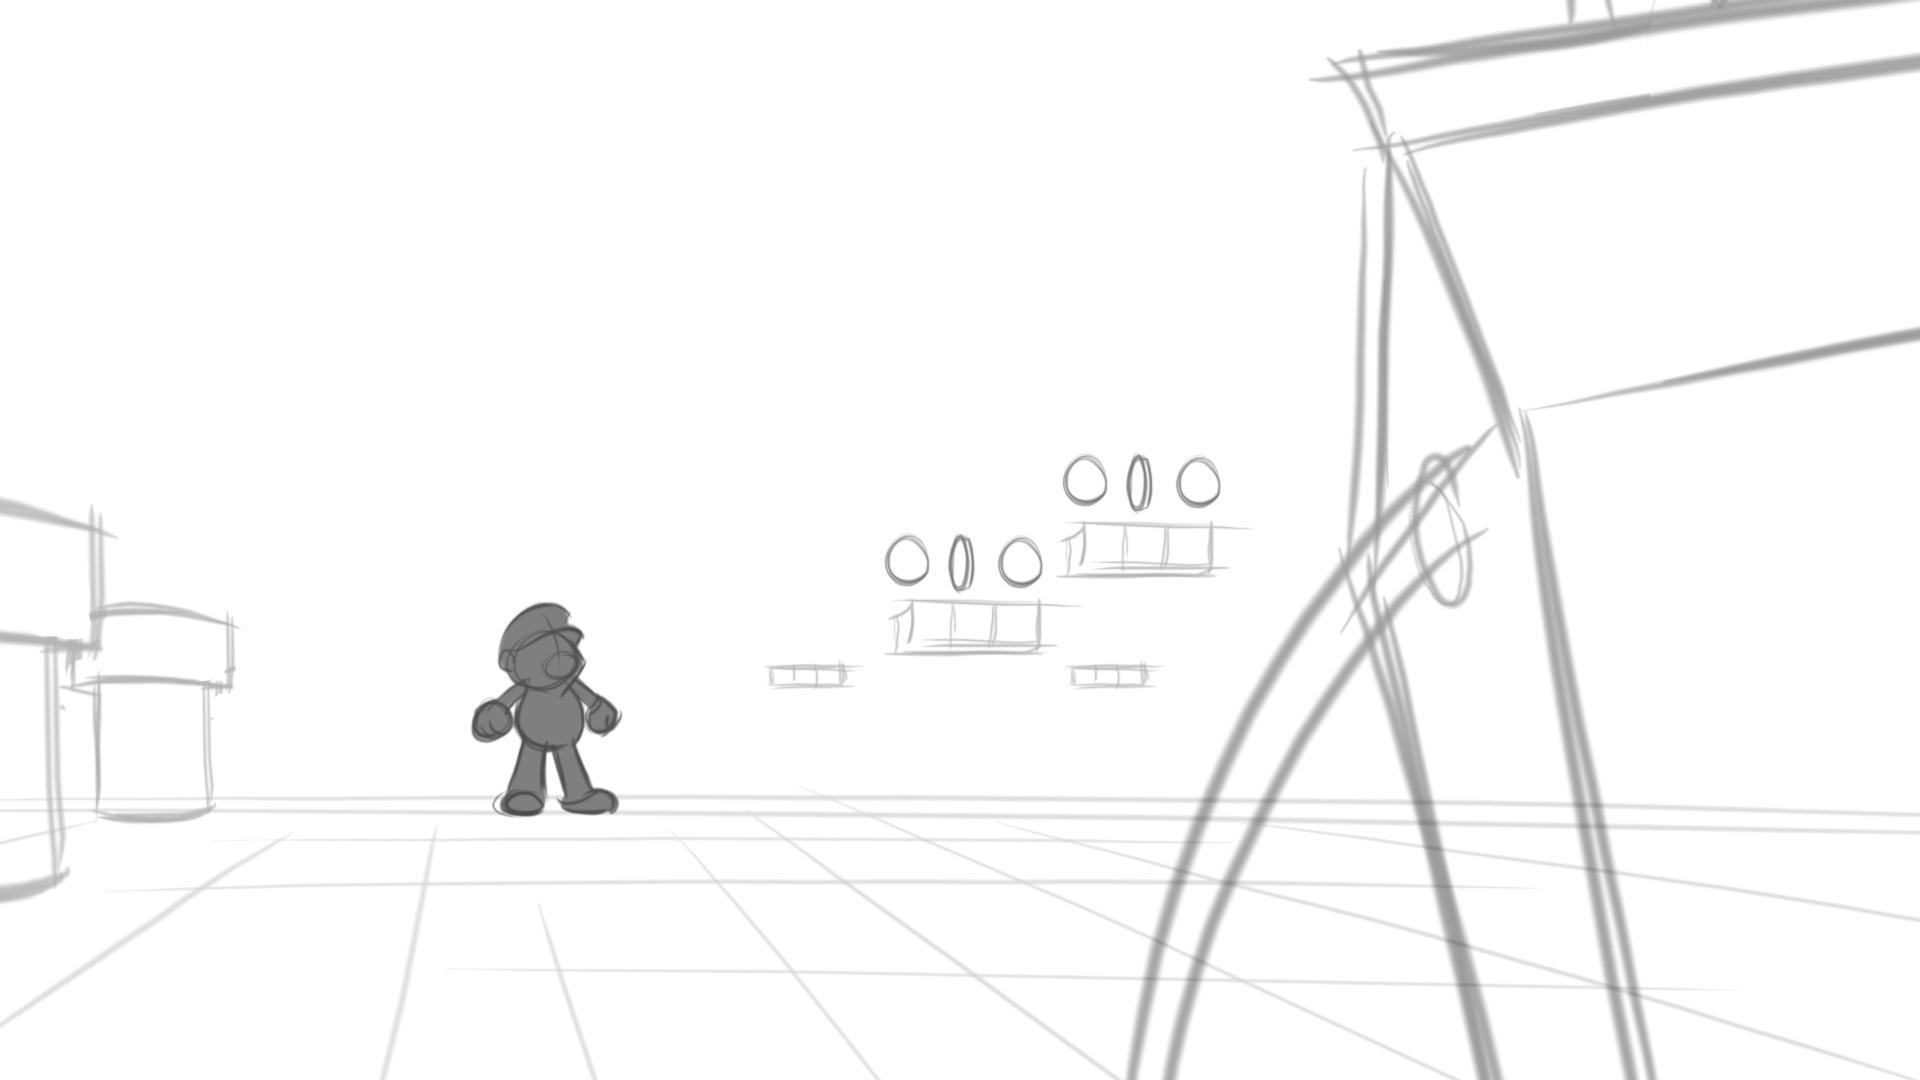 Mario-05-07.jpg